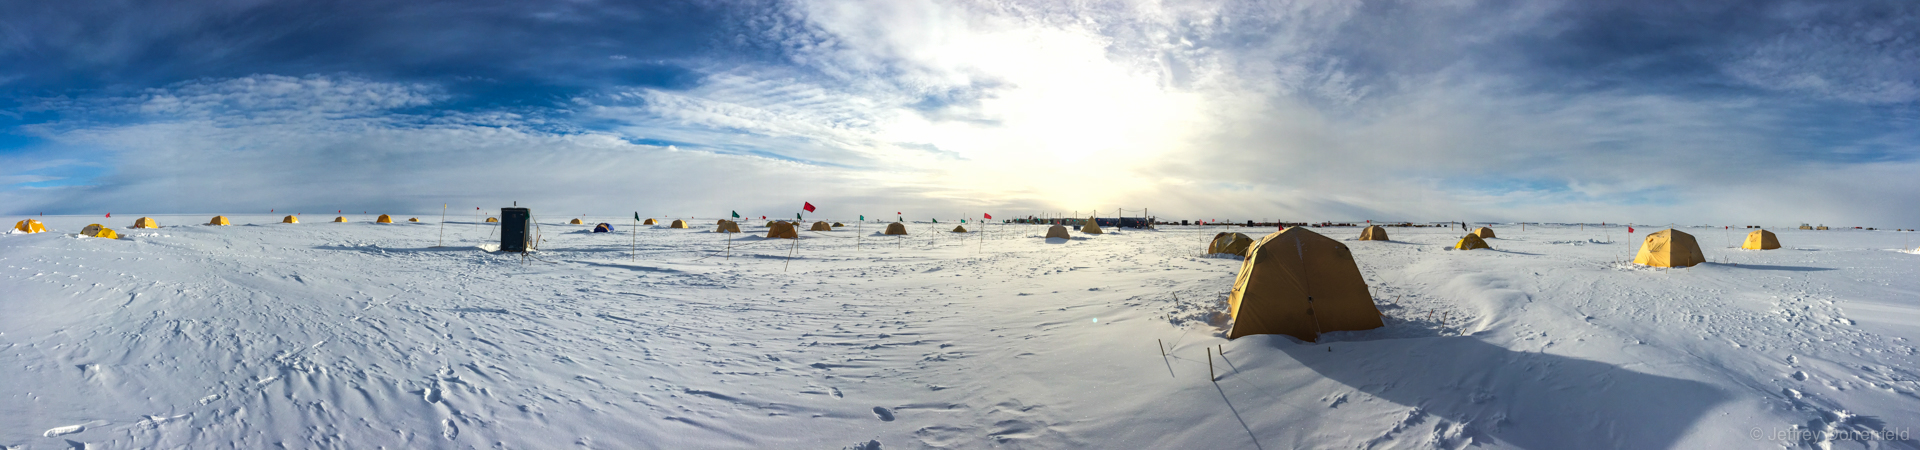 IMG_1409-2015-01-09 Tent City-Donenfeld-1920-WM